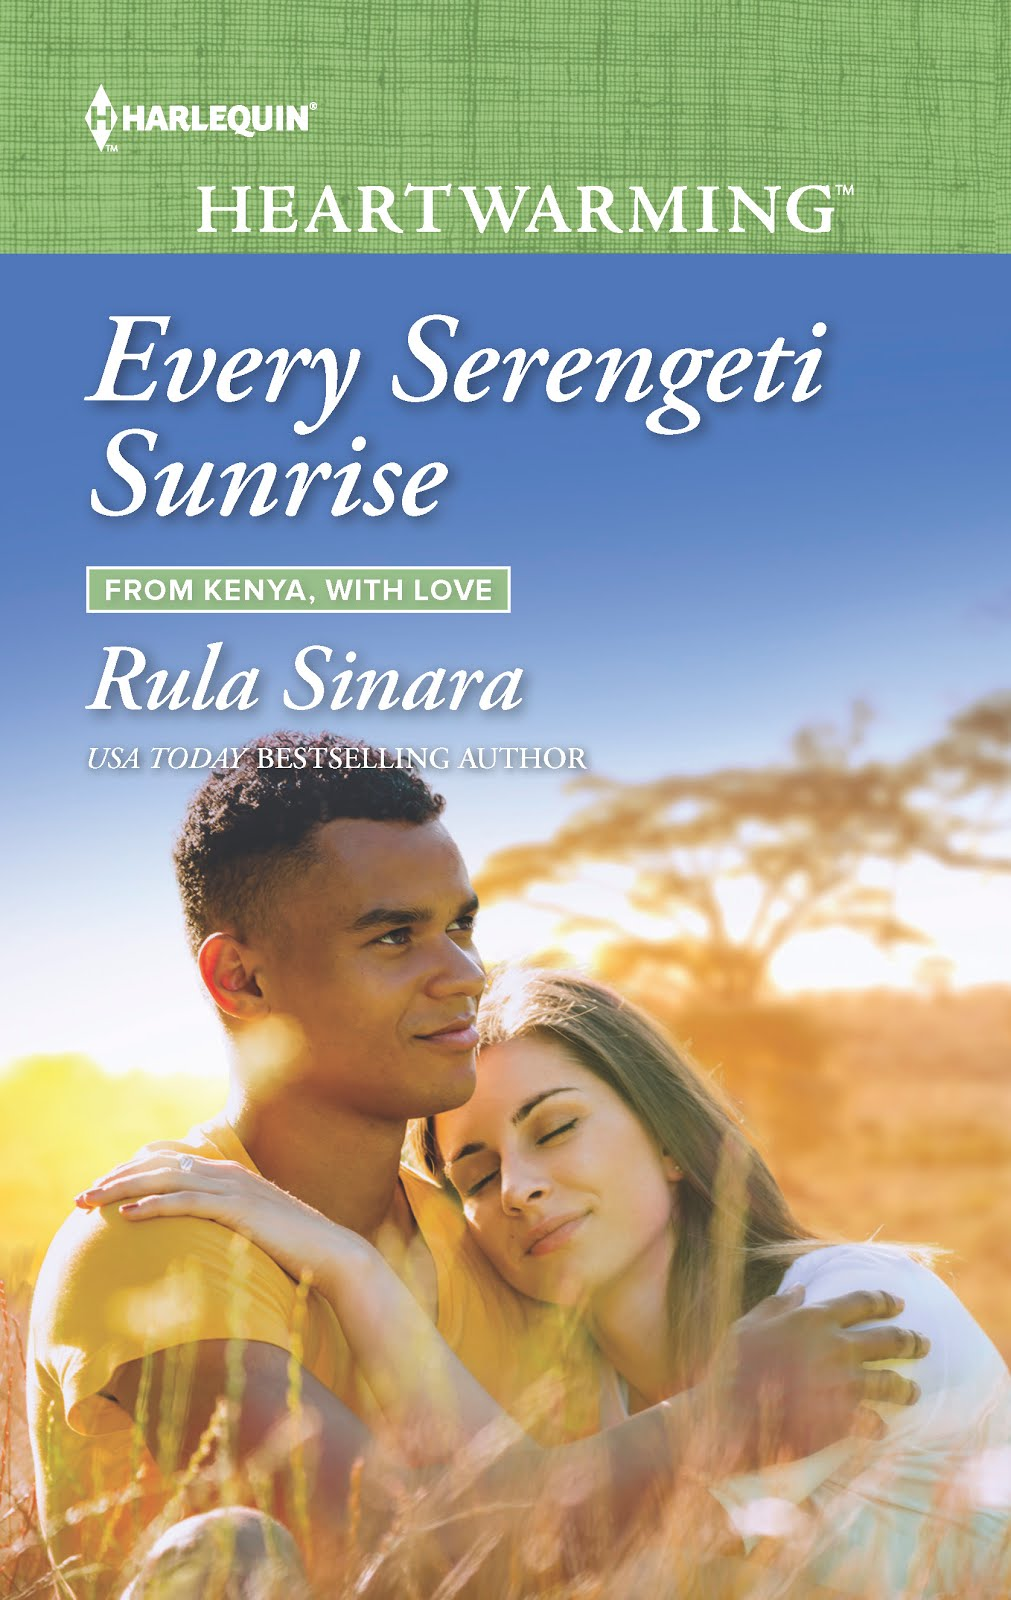 Every Serengeti Sunrise